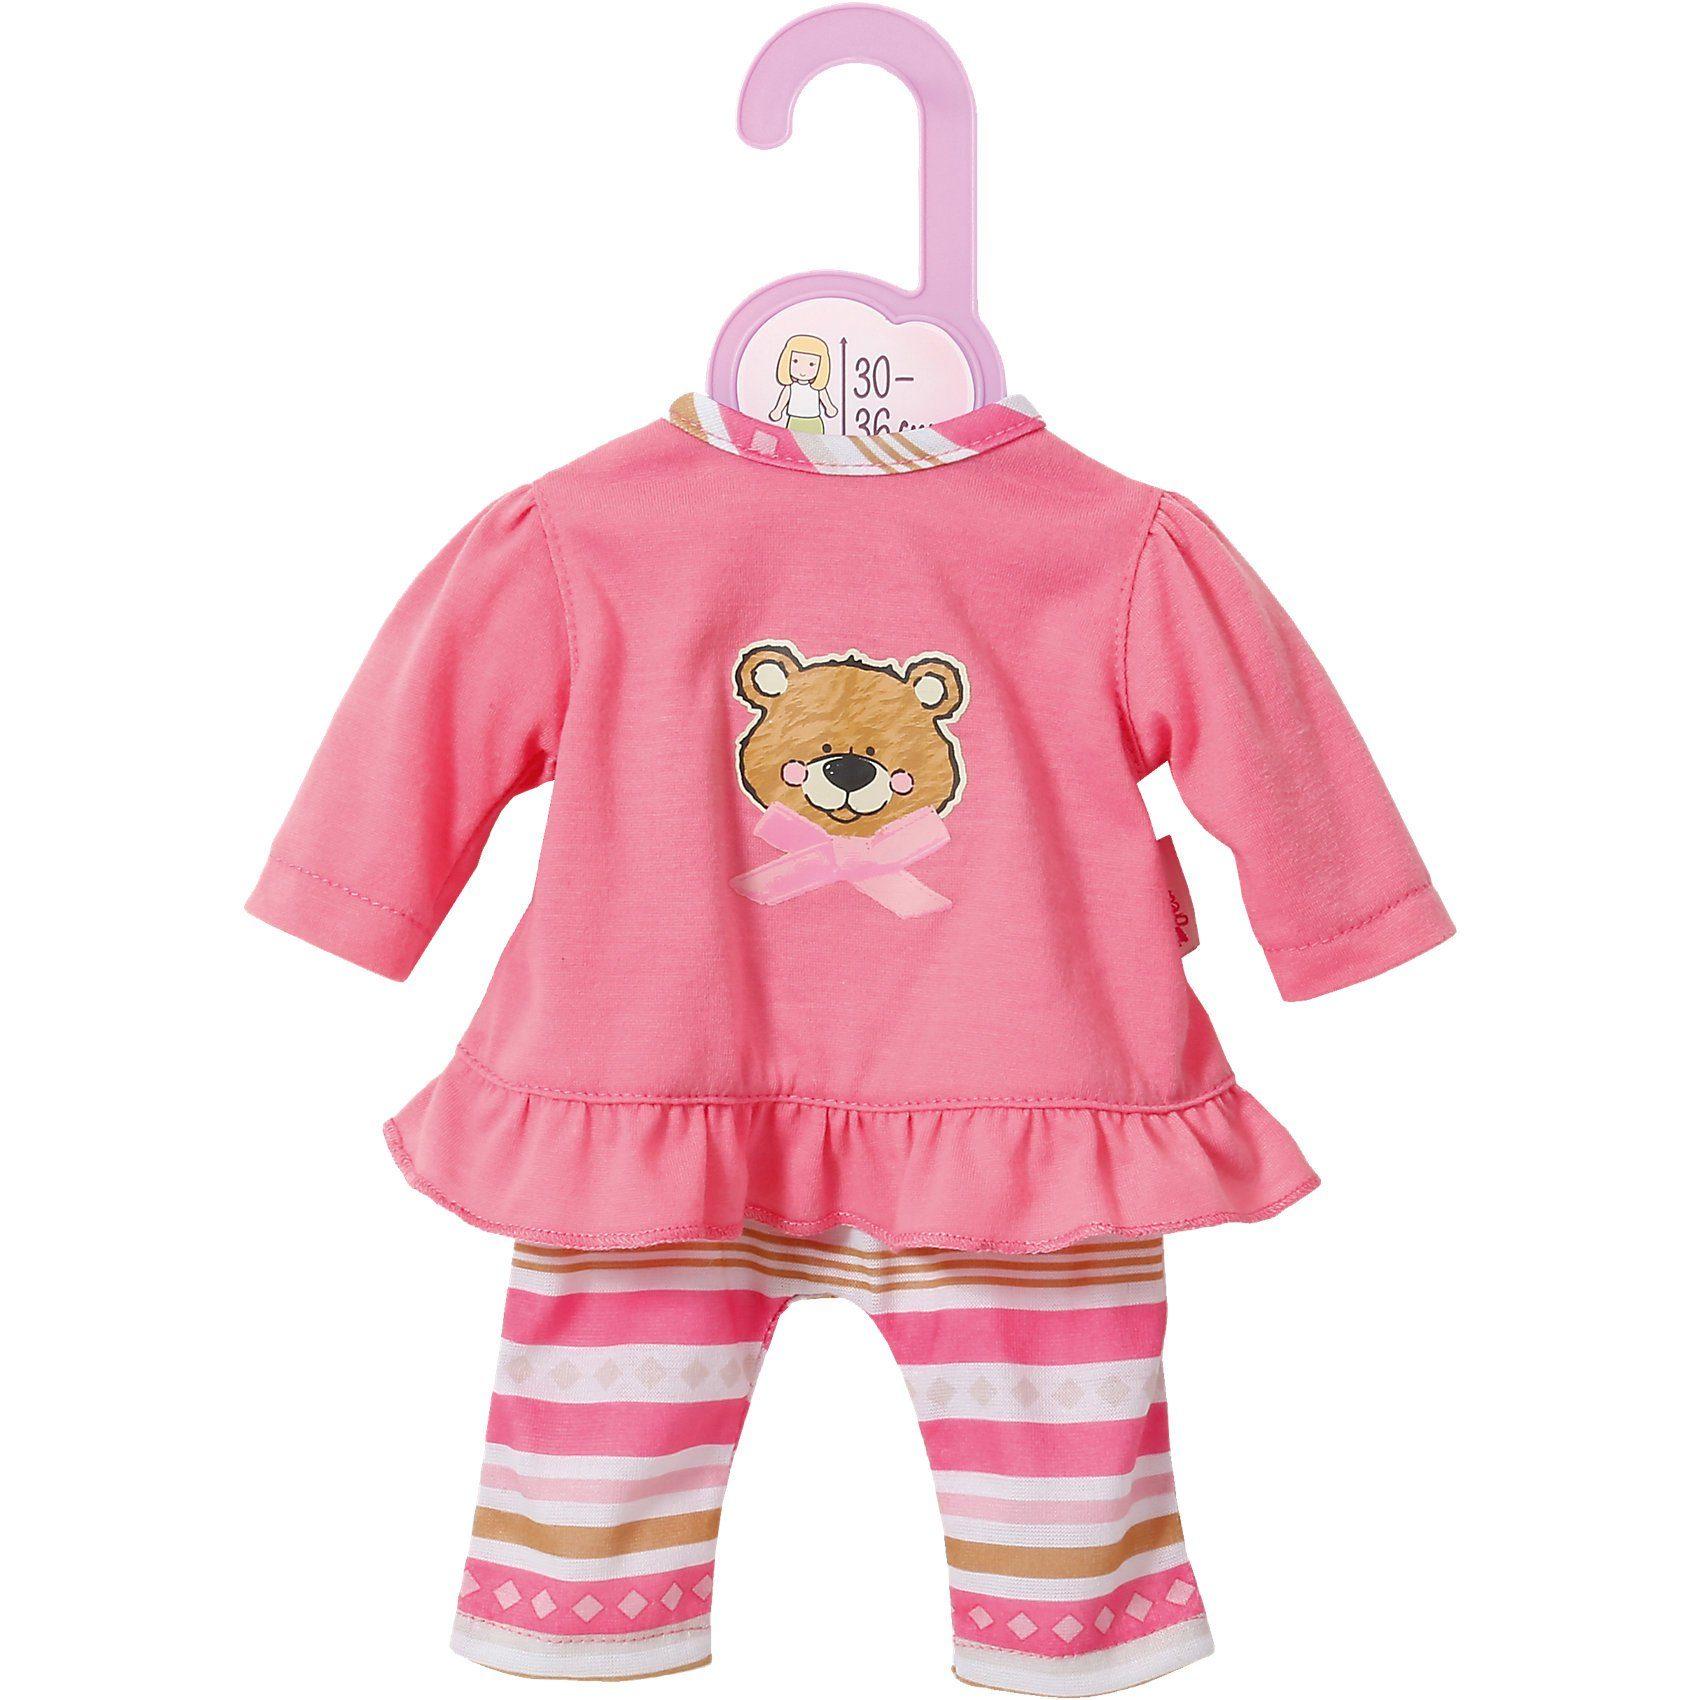 Zapf Creation Dolly Moda Pyjama 30-36 cm